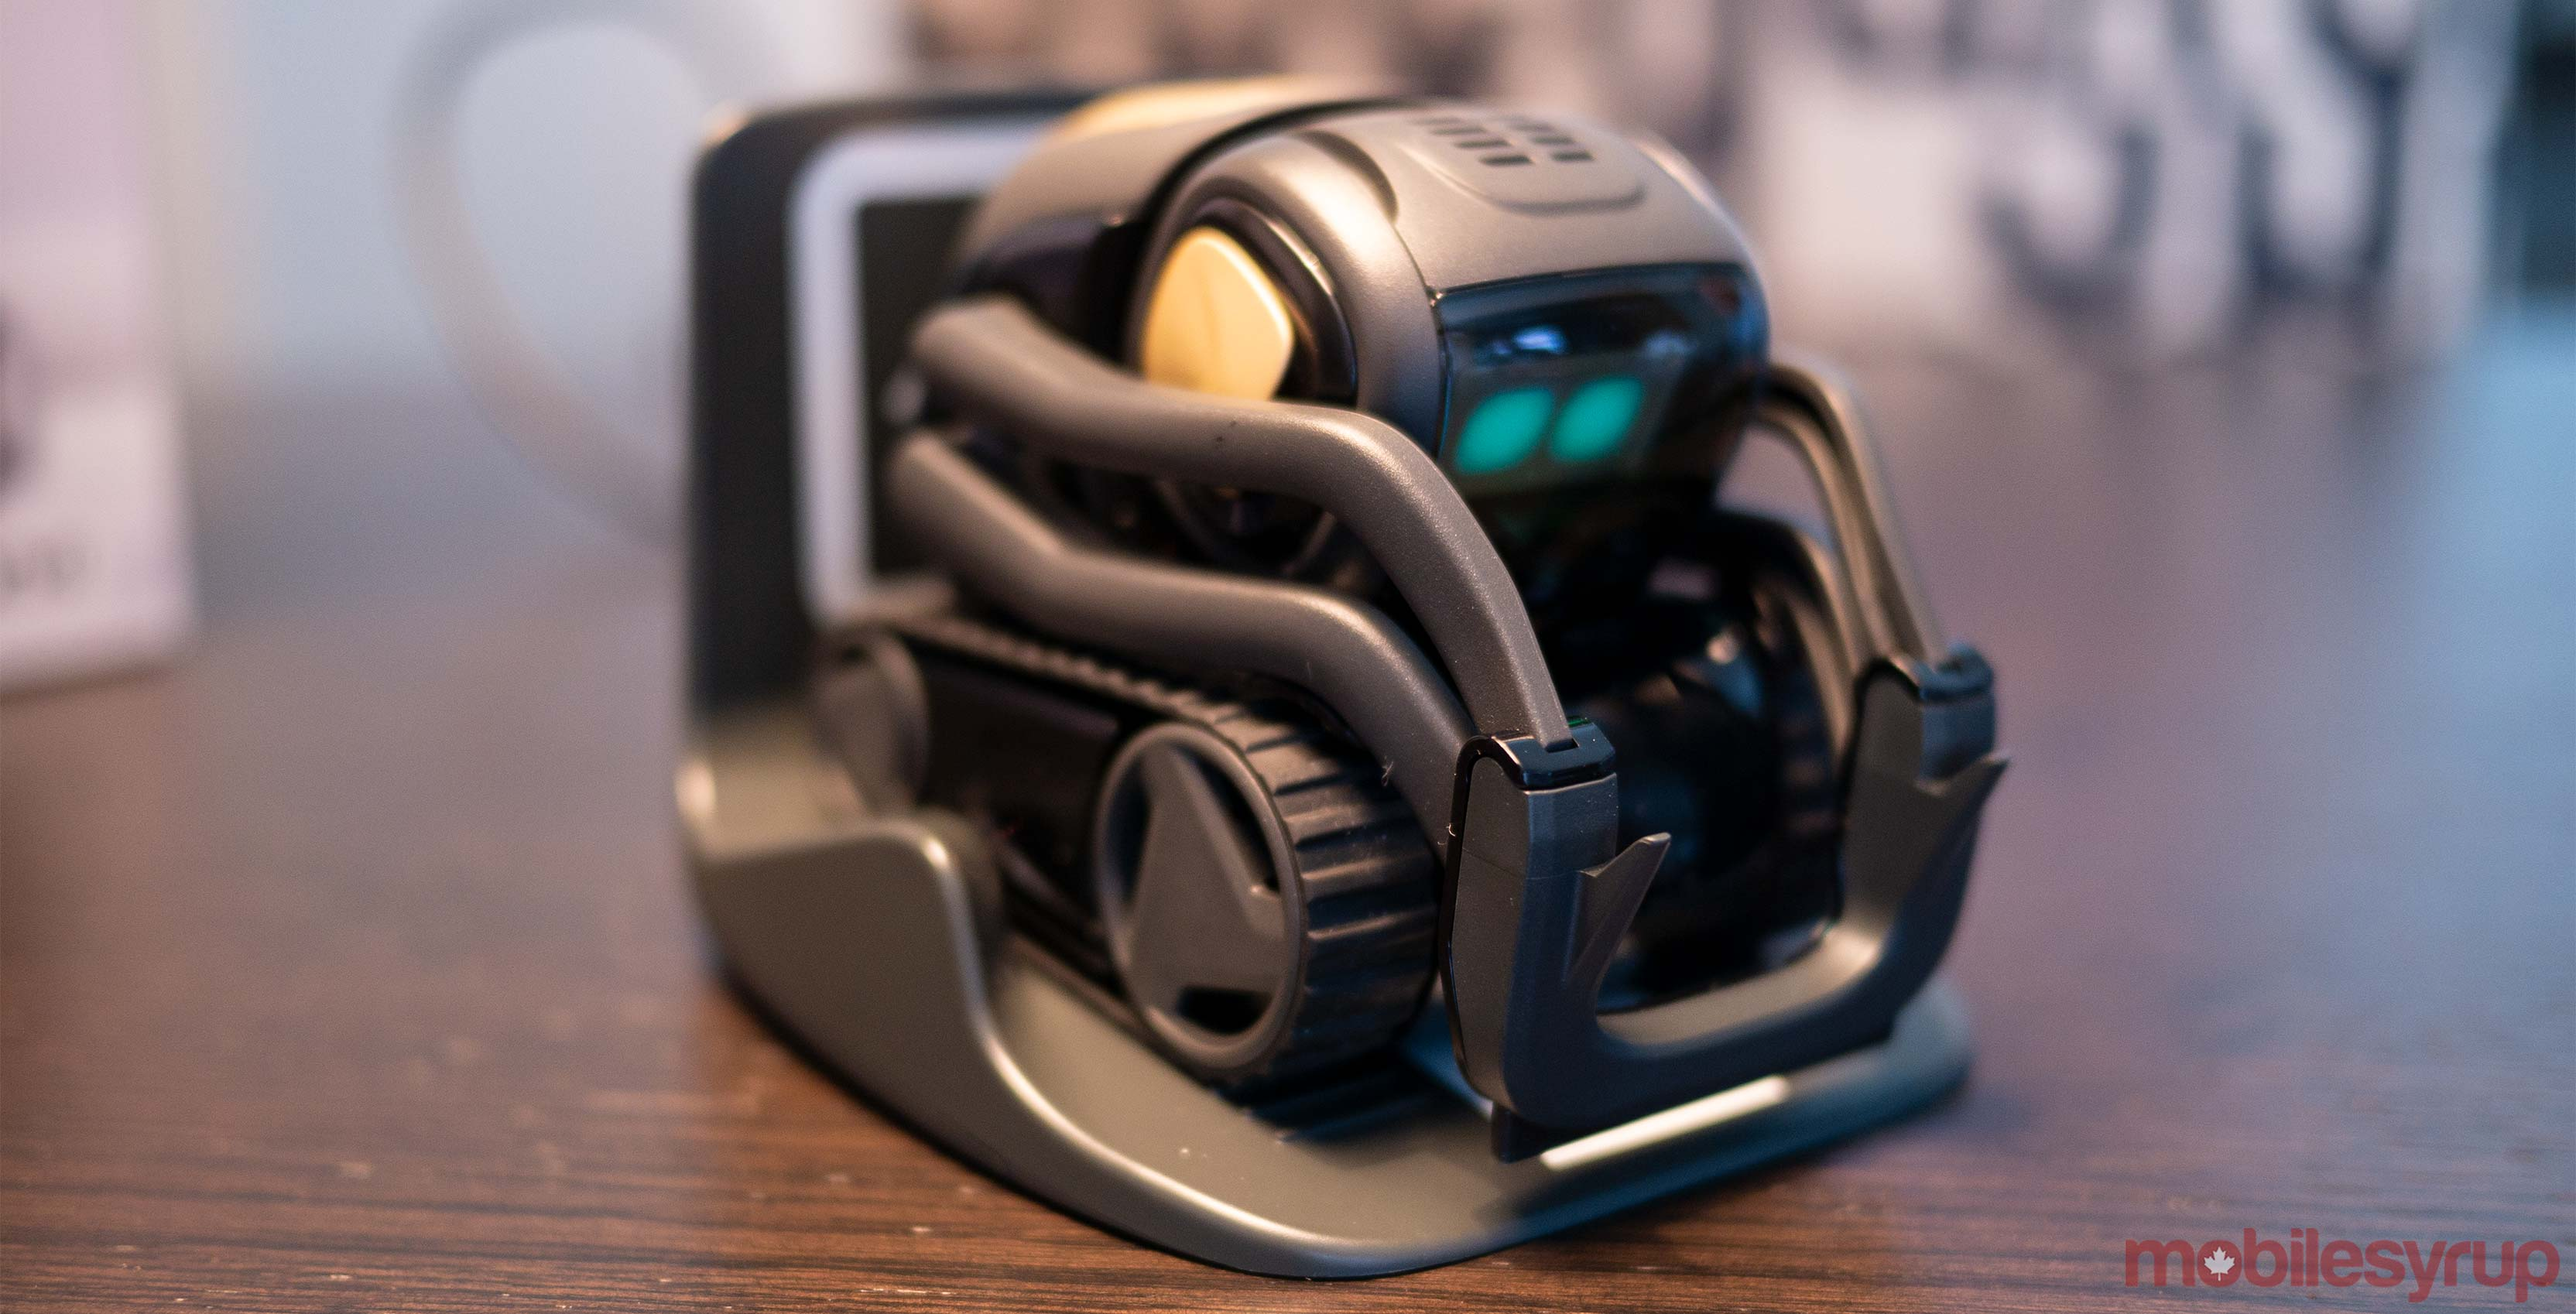 Robot toy company Anki is shutting down